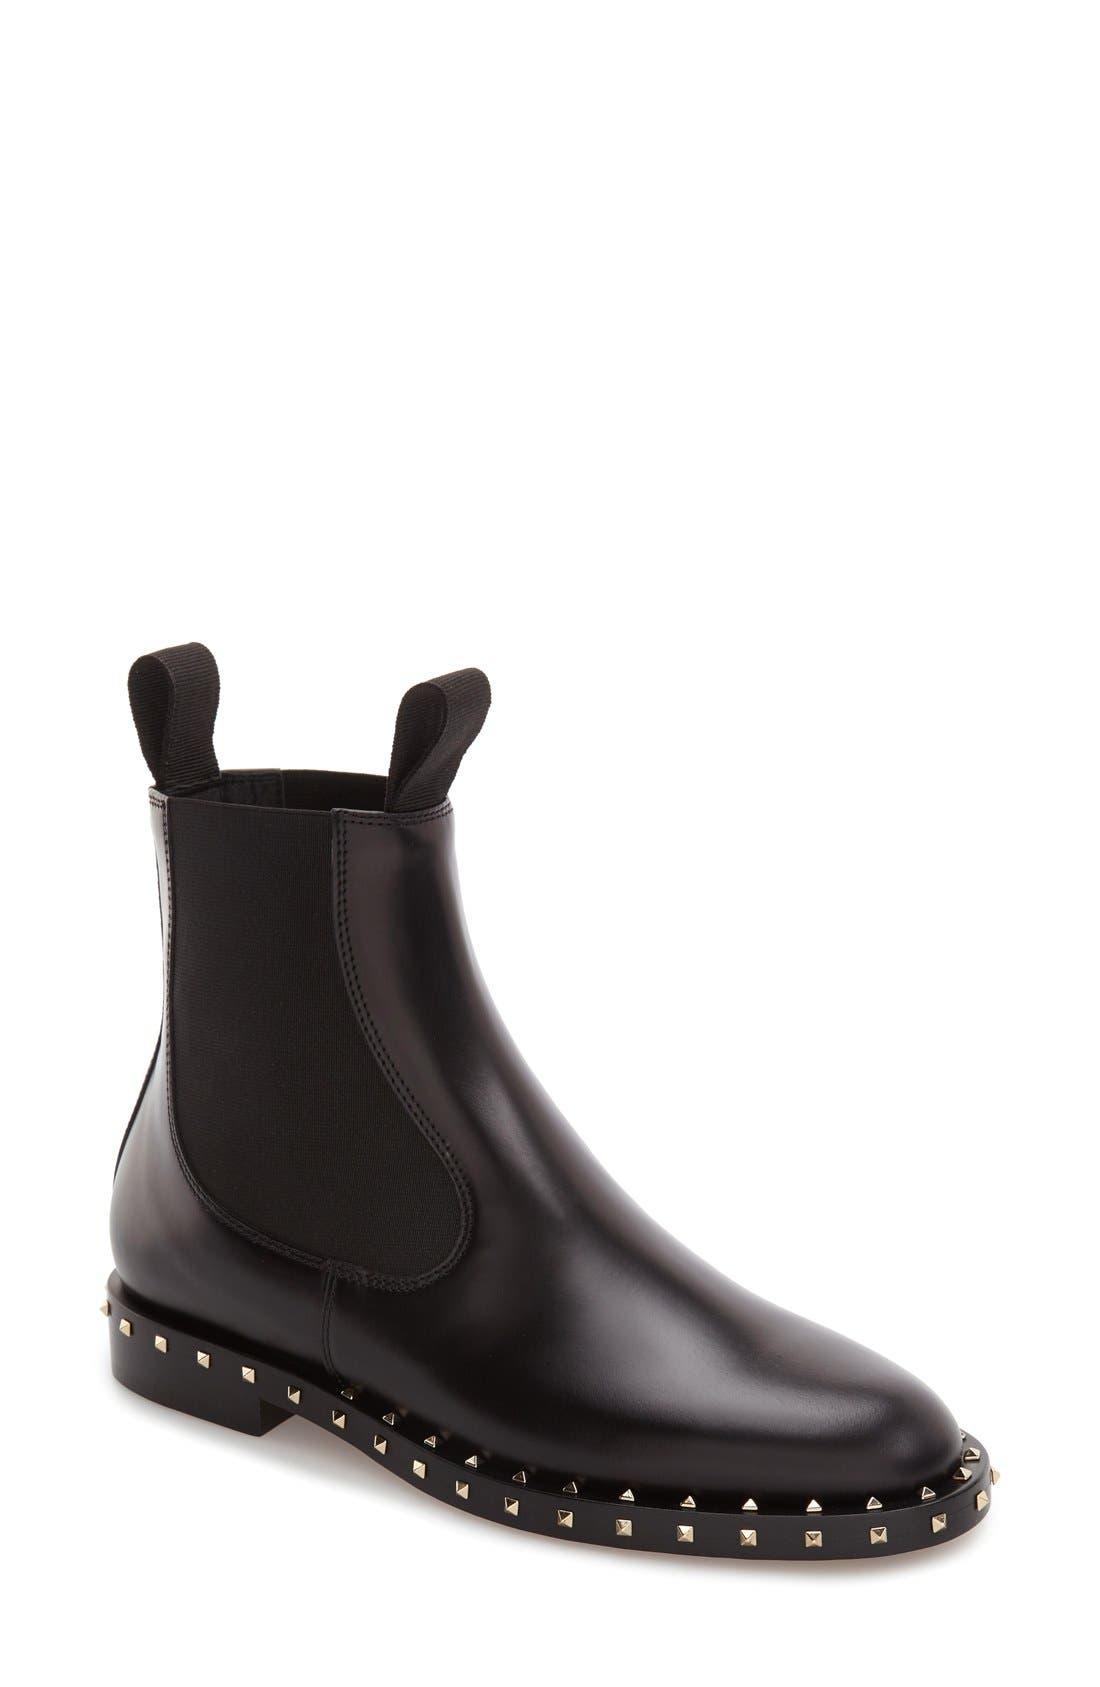 Alternate Image 1 Selected - Valentino Rockstud Chelsea Boot (Women)